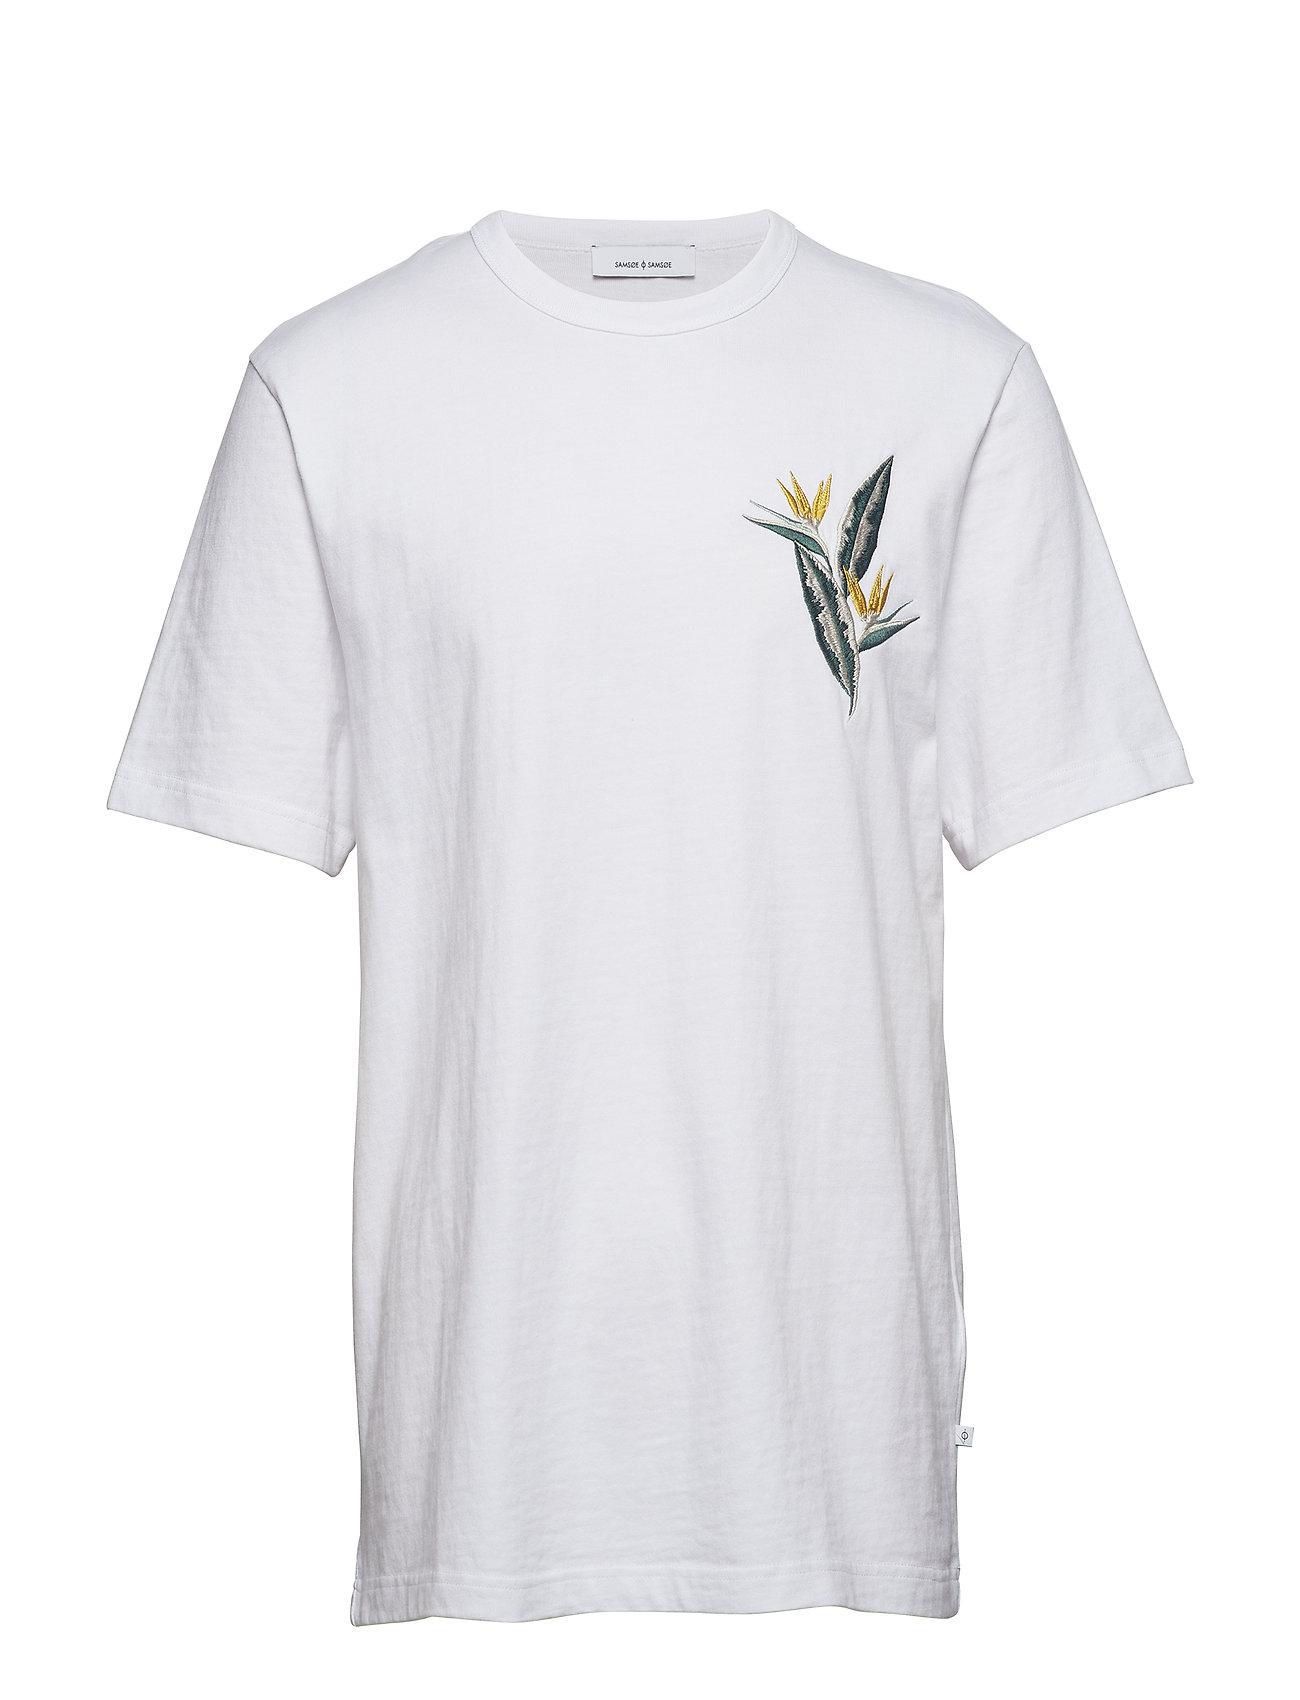 Samsøe & Samsøe Ballerup t-shirt 8238 - WHITE